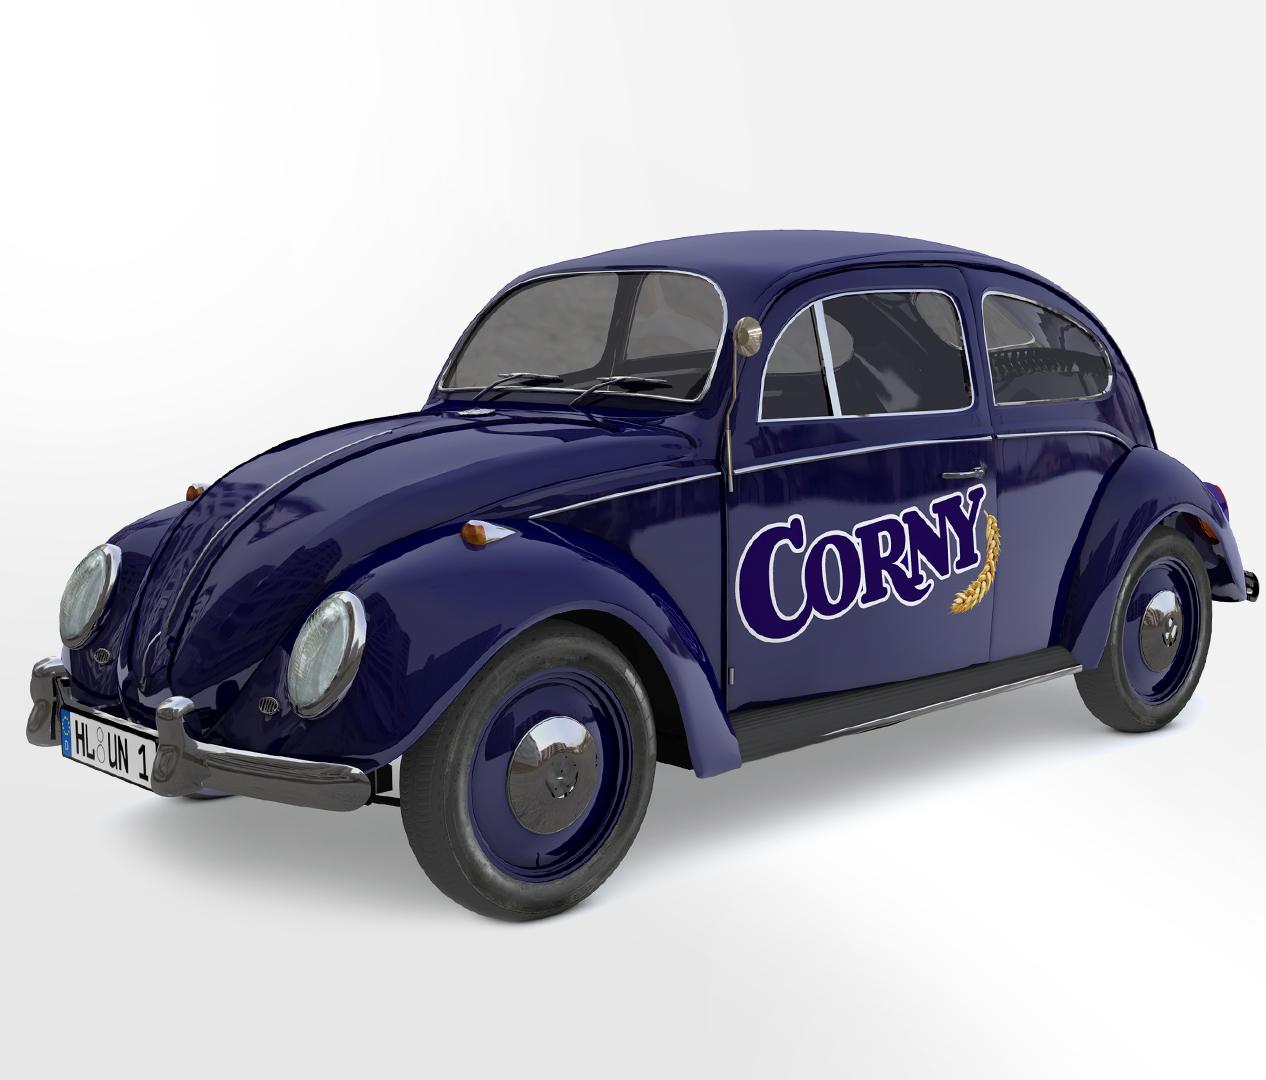 Corny Jubiläum - Promotion Käfer